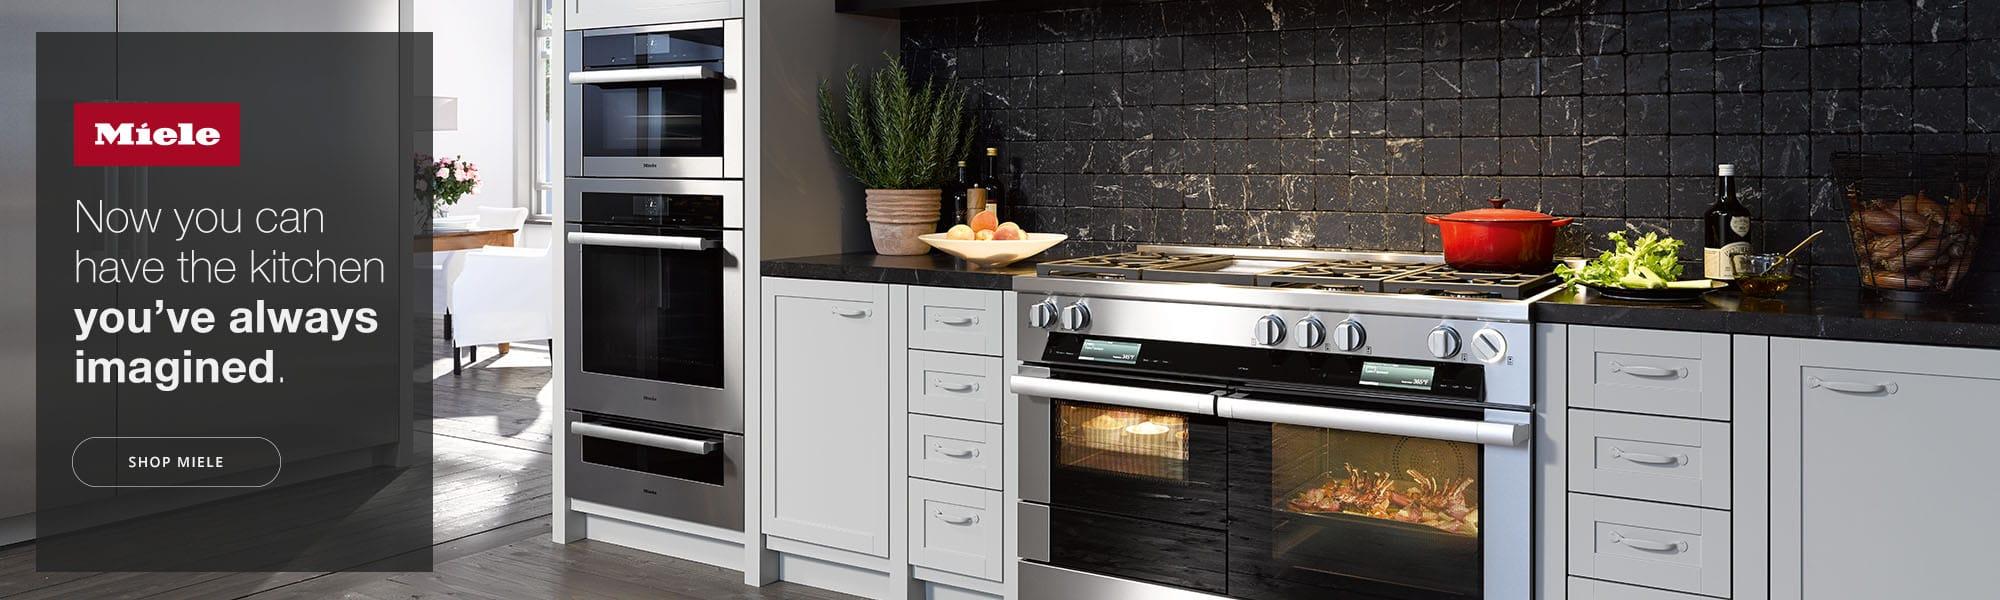 Kitchen appliances san francisco cherin s appliance home - Kitchen appliances san francisco ...